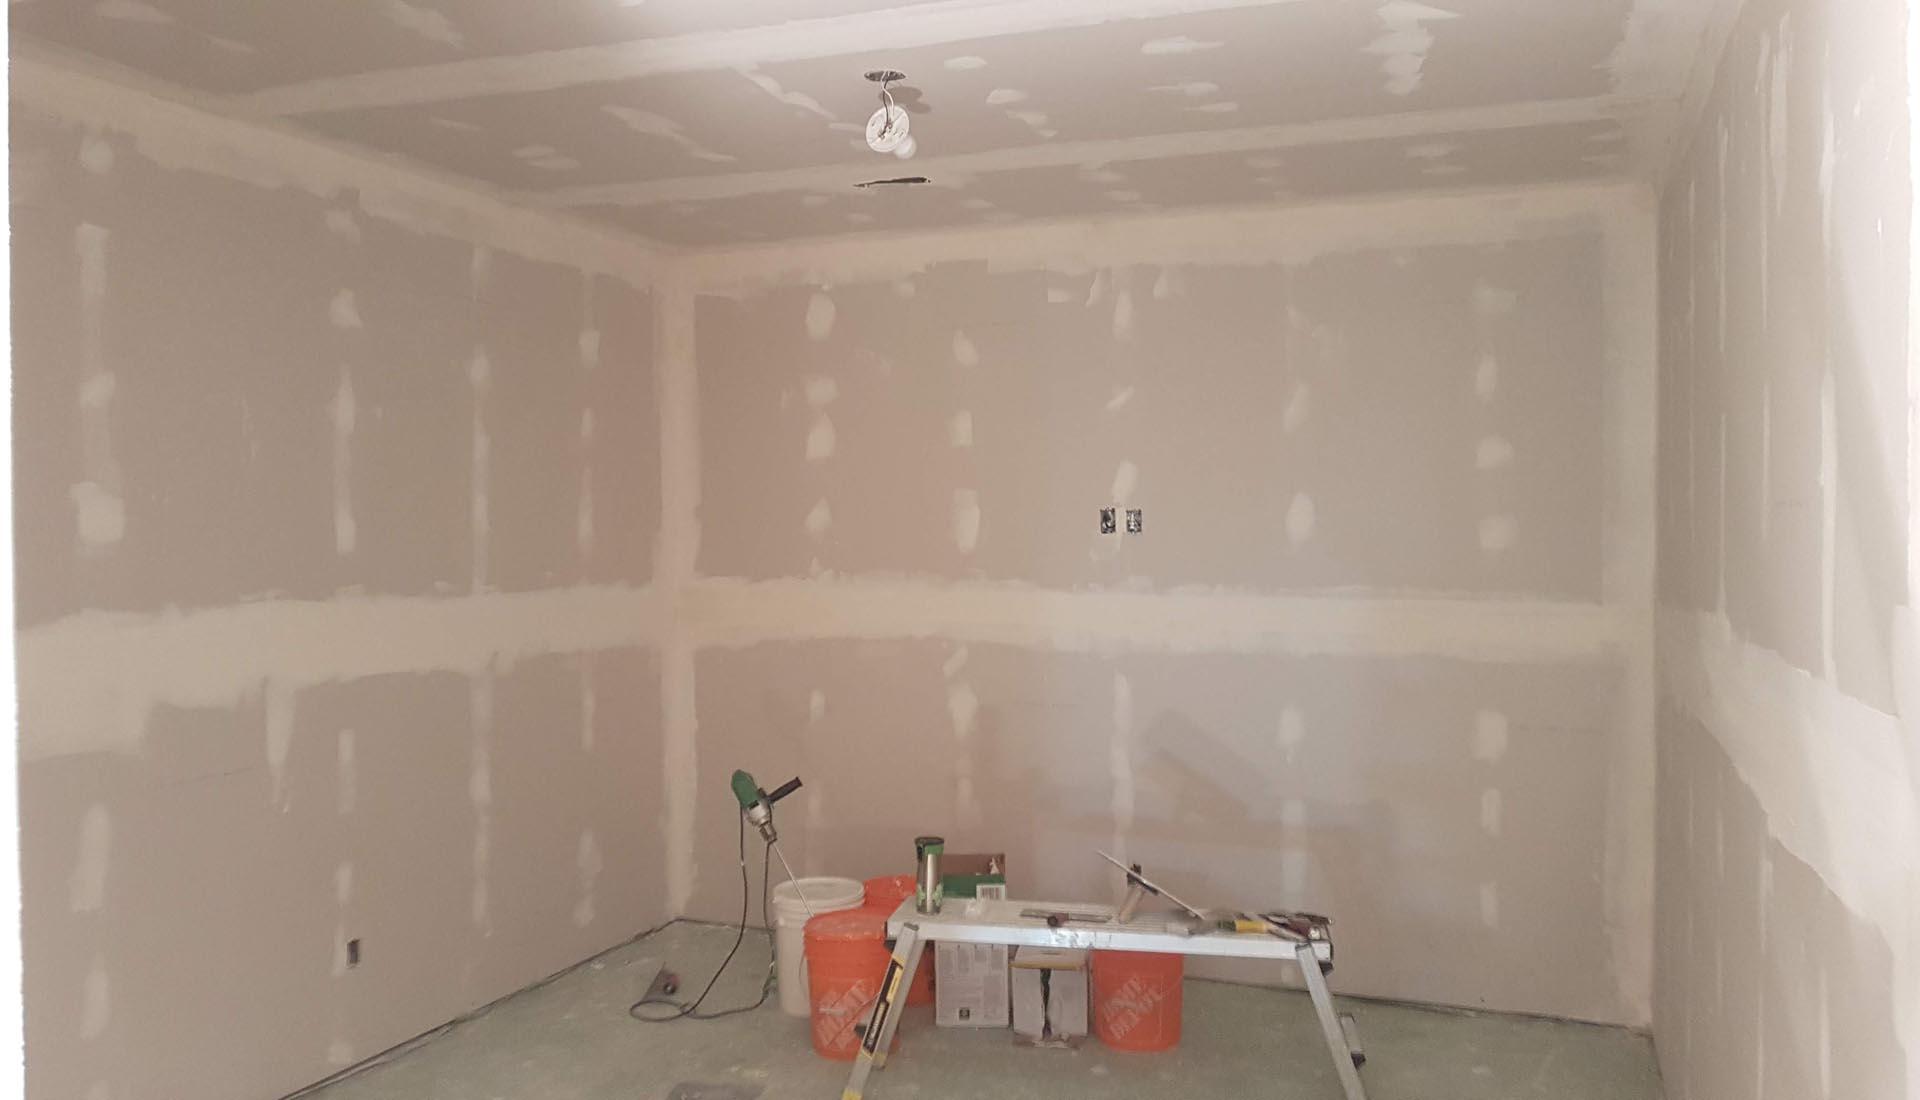 Drywall Hanging Mudding Sanding Renewvation Calgary Renovations Handyman